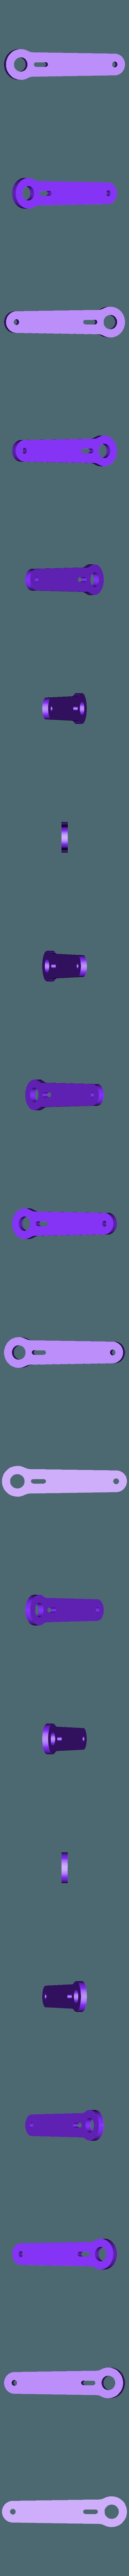 Leg_Servo_Arm.stl Download free STL file mePed Quadruped Robot • 3D printing template, MinorSymphony